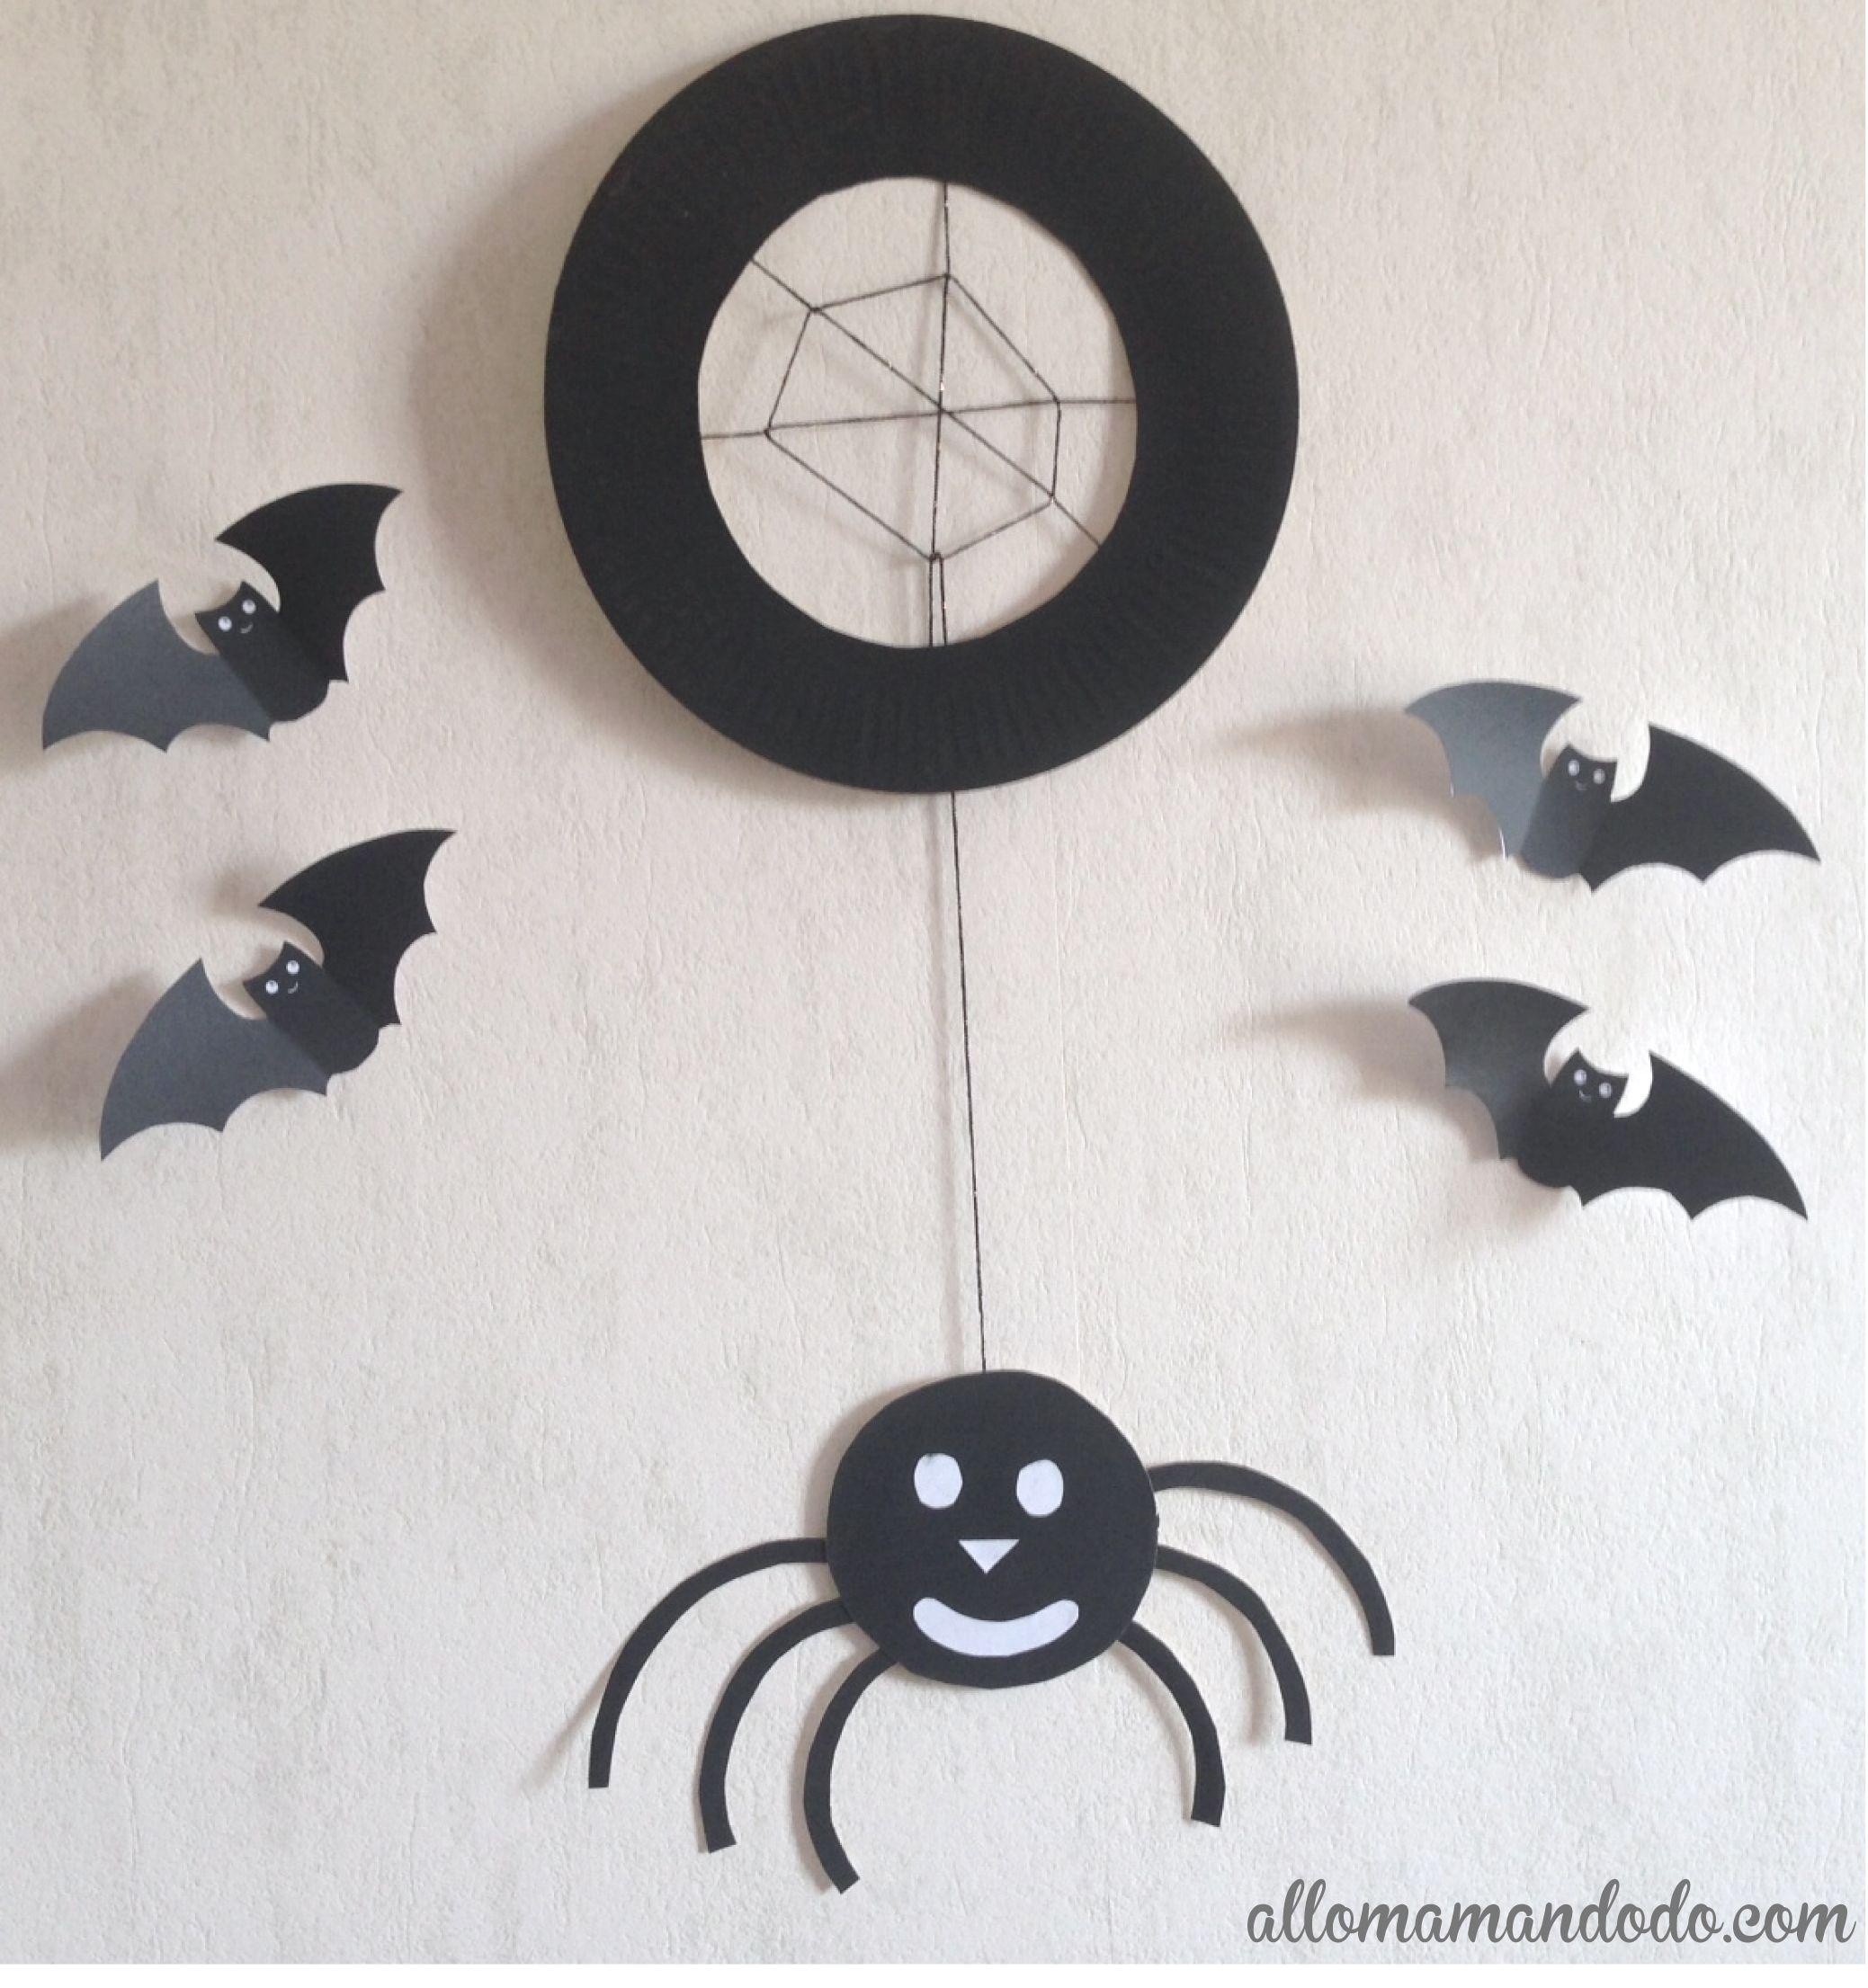 tuto diy d 39 halloween l 39 araign e base d 39 assiette en. Black Bedroom Furniture Sets. Home Design Ideas